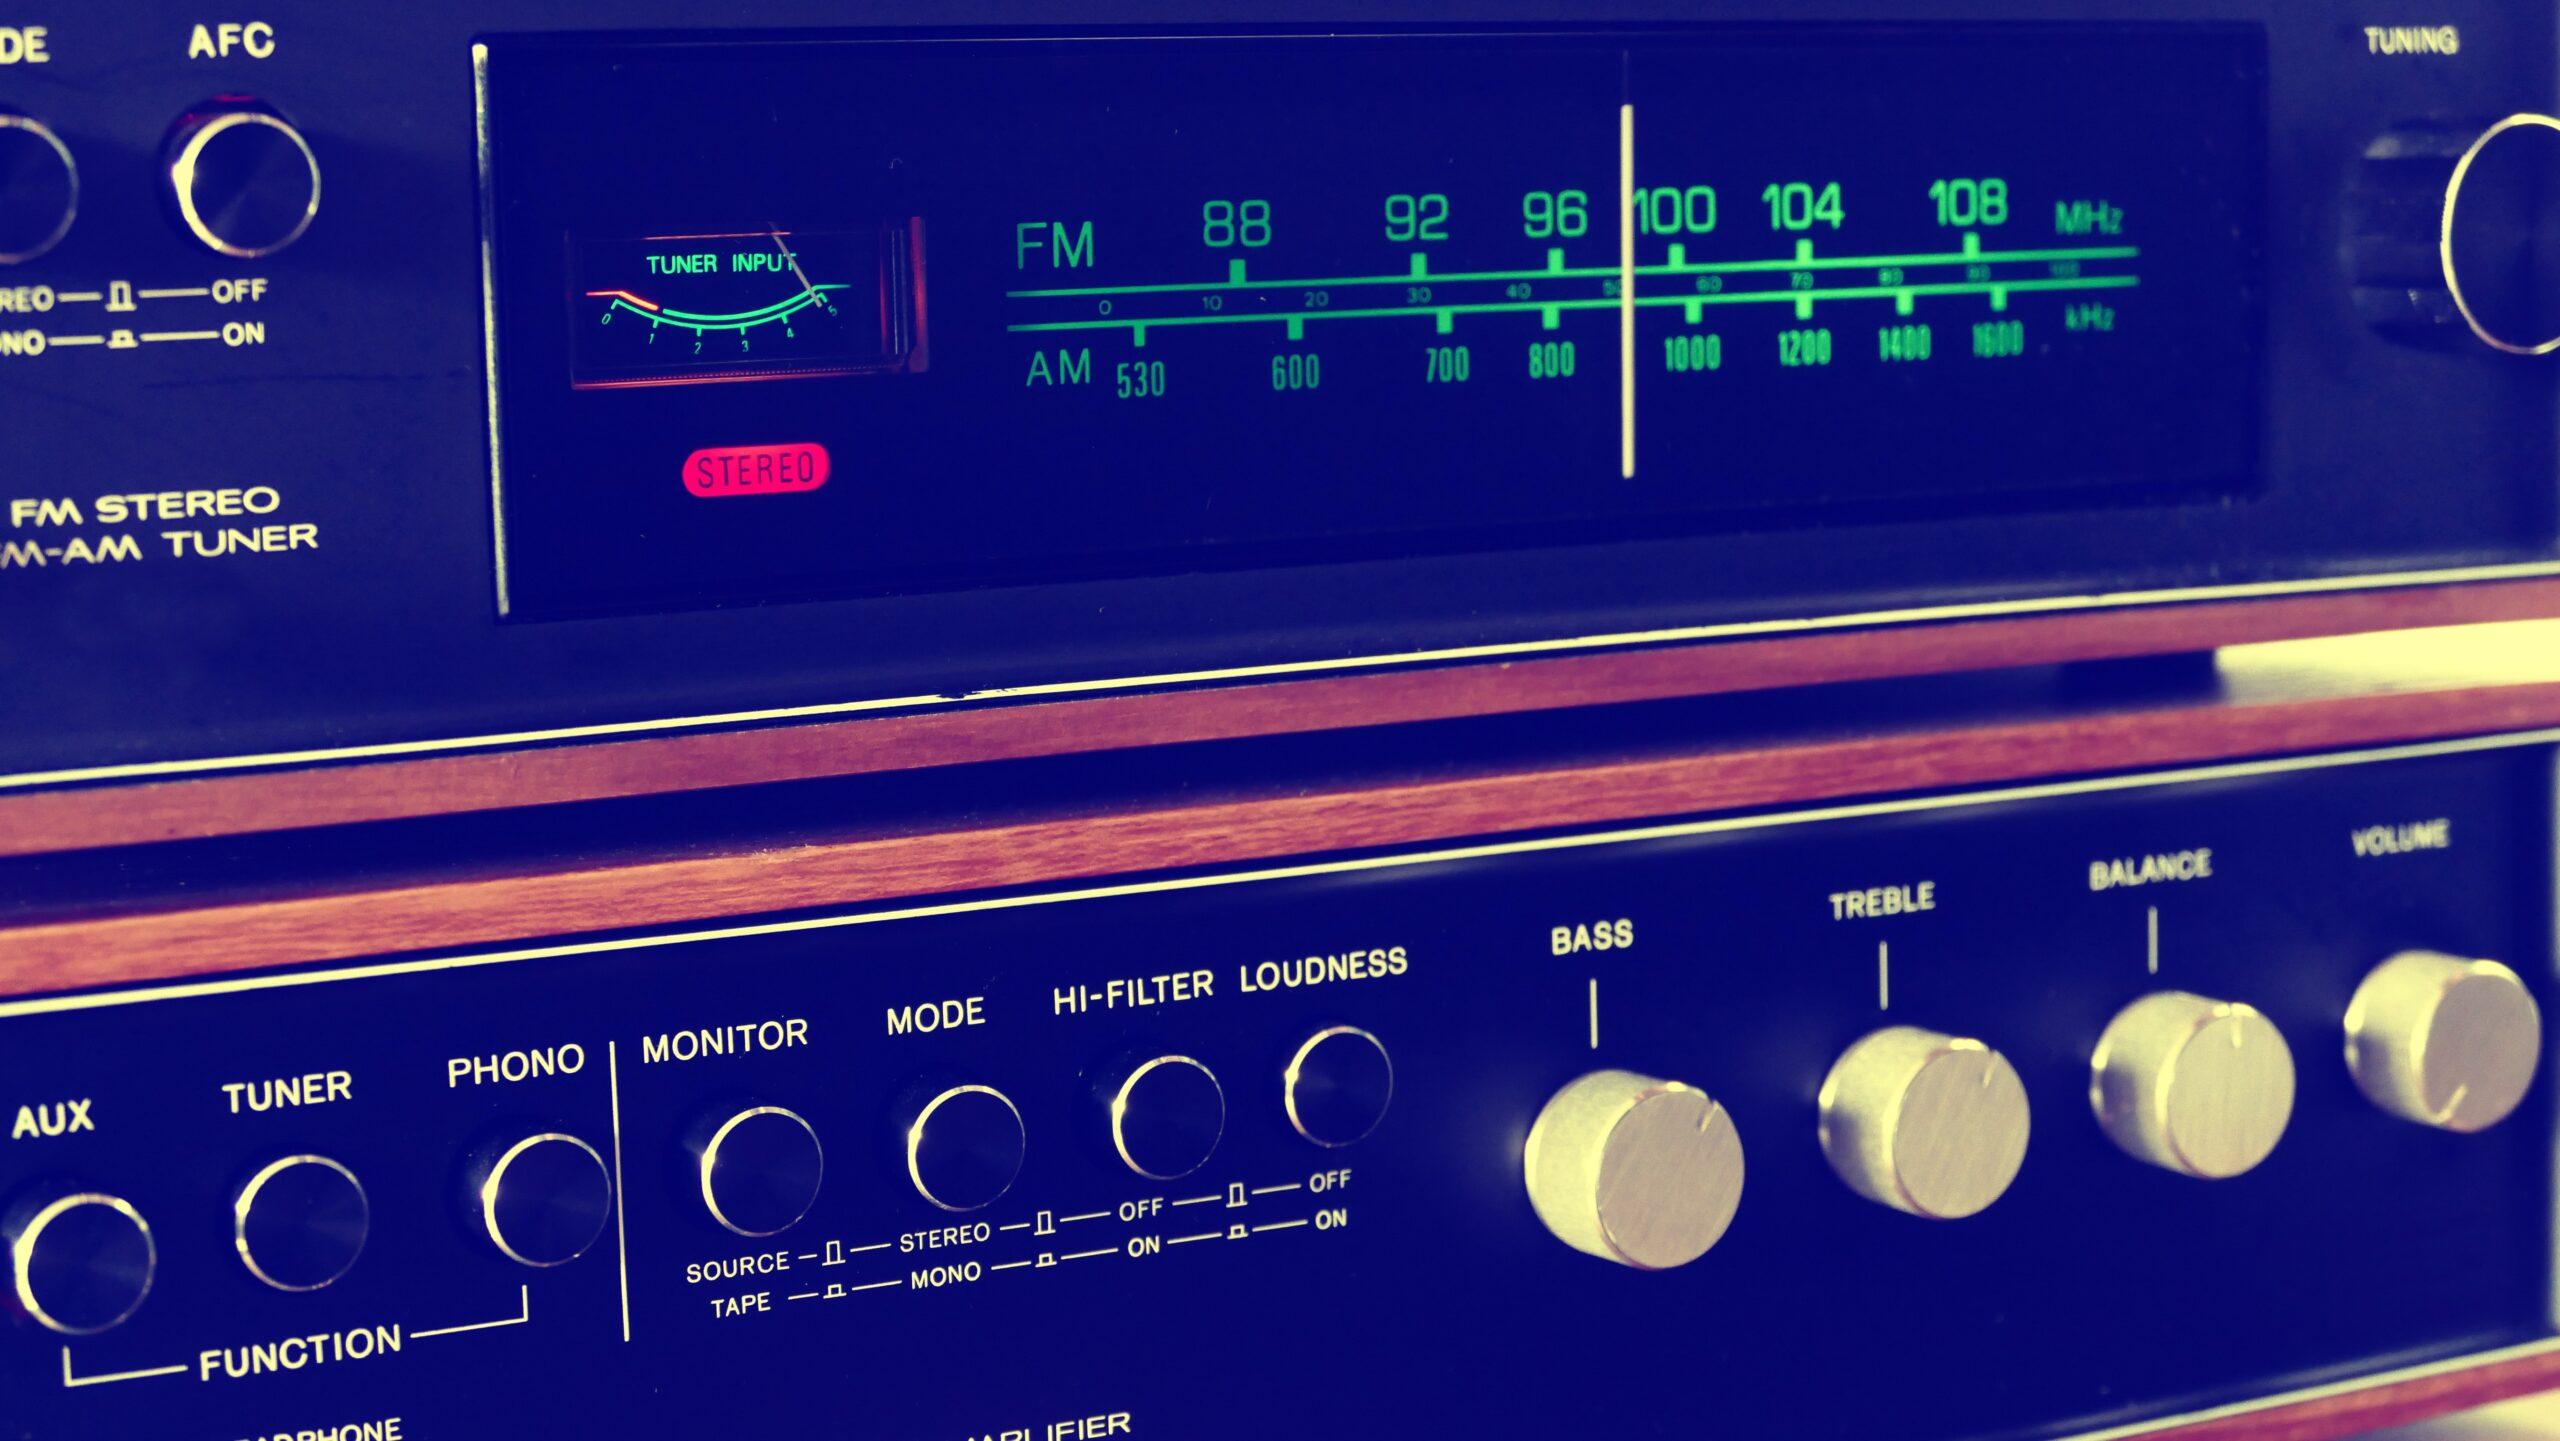 analogue-buttons-design-display-157557